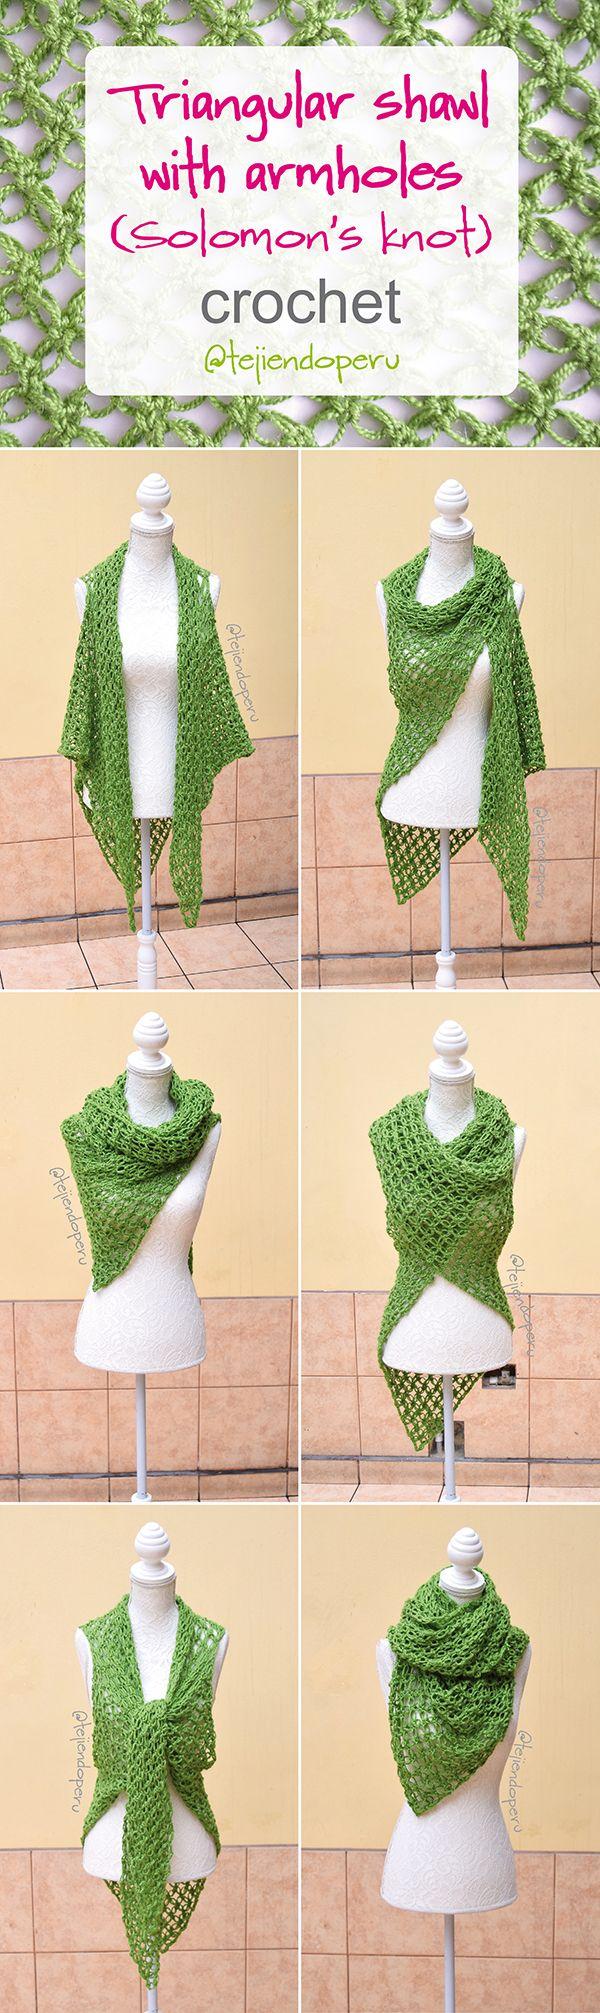 Crochet Triangular Shawl With Armholes Solomon S Knot Stitch